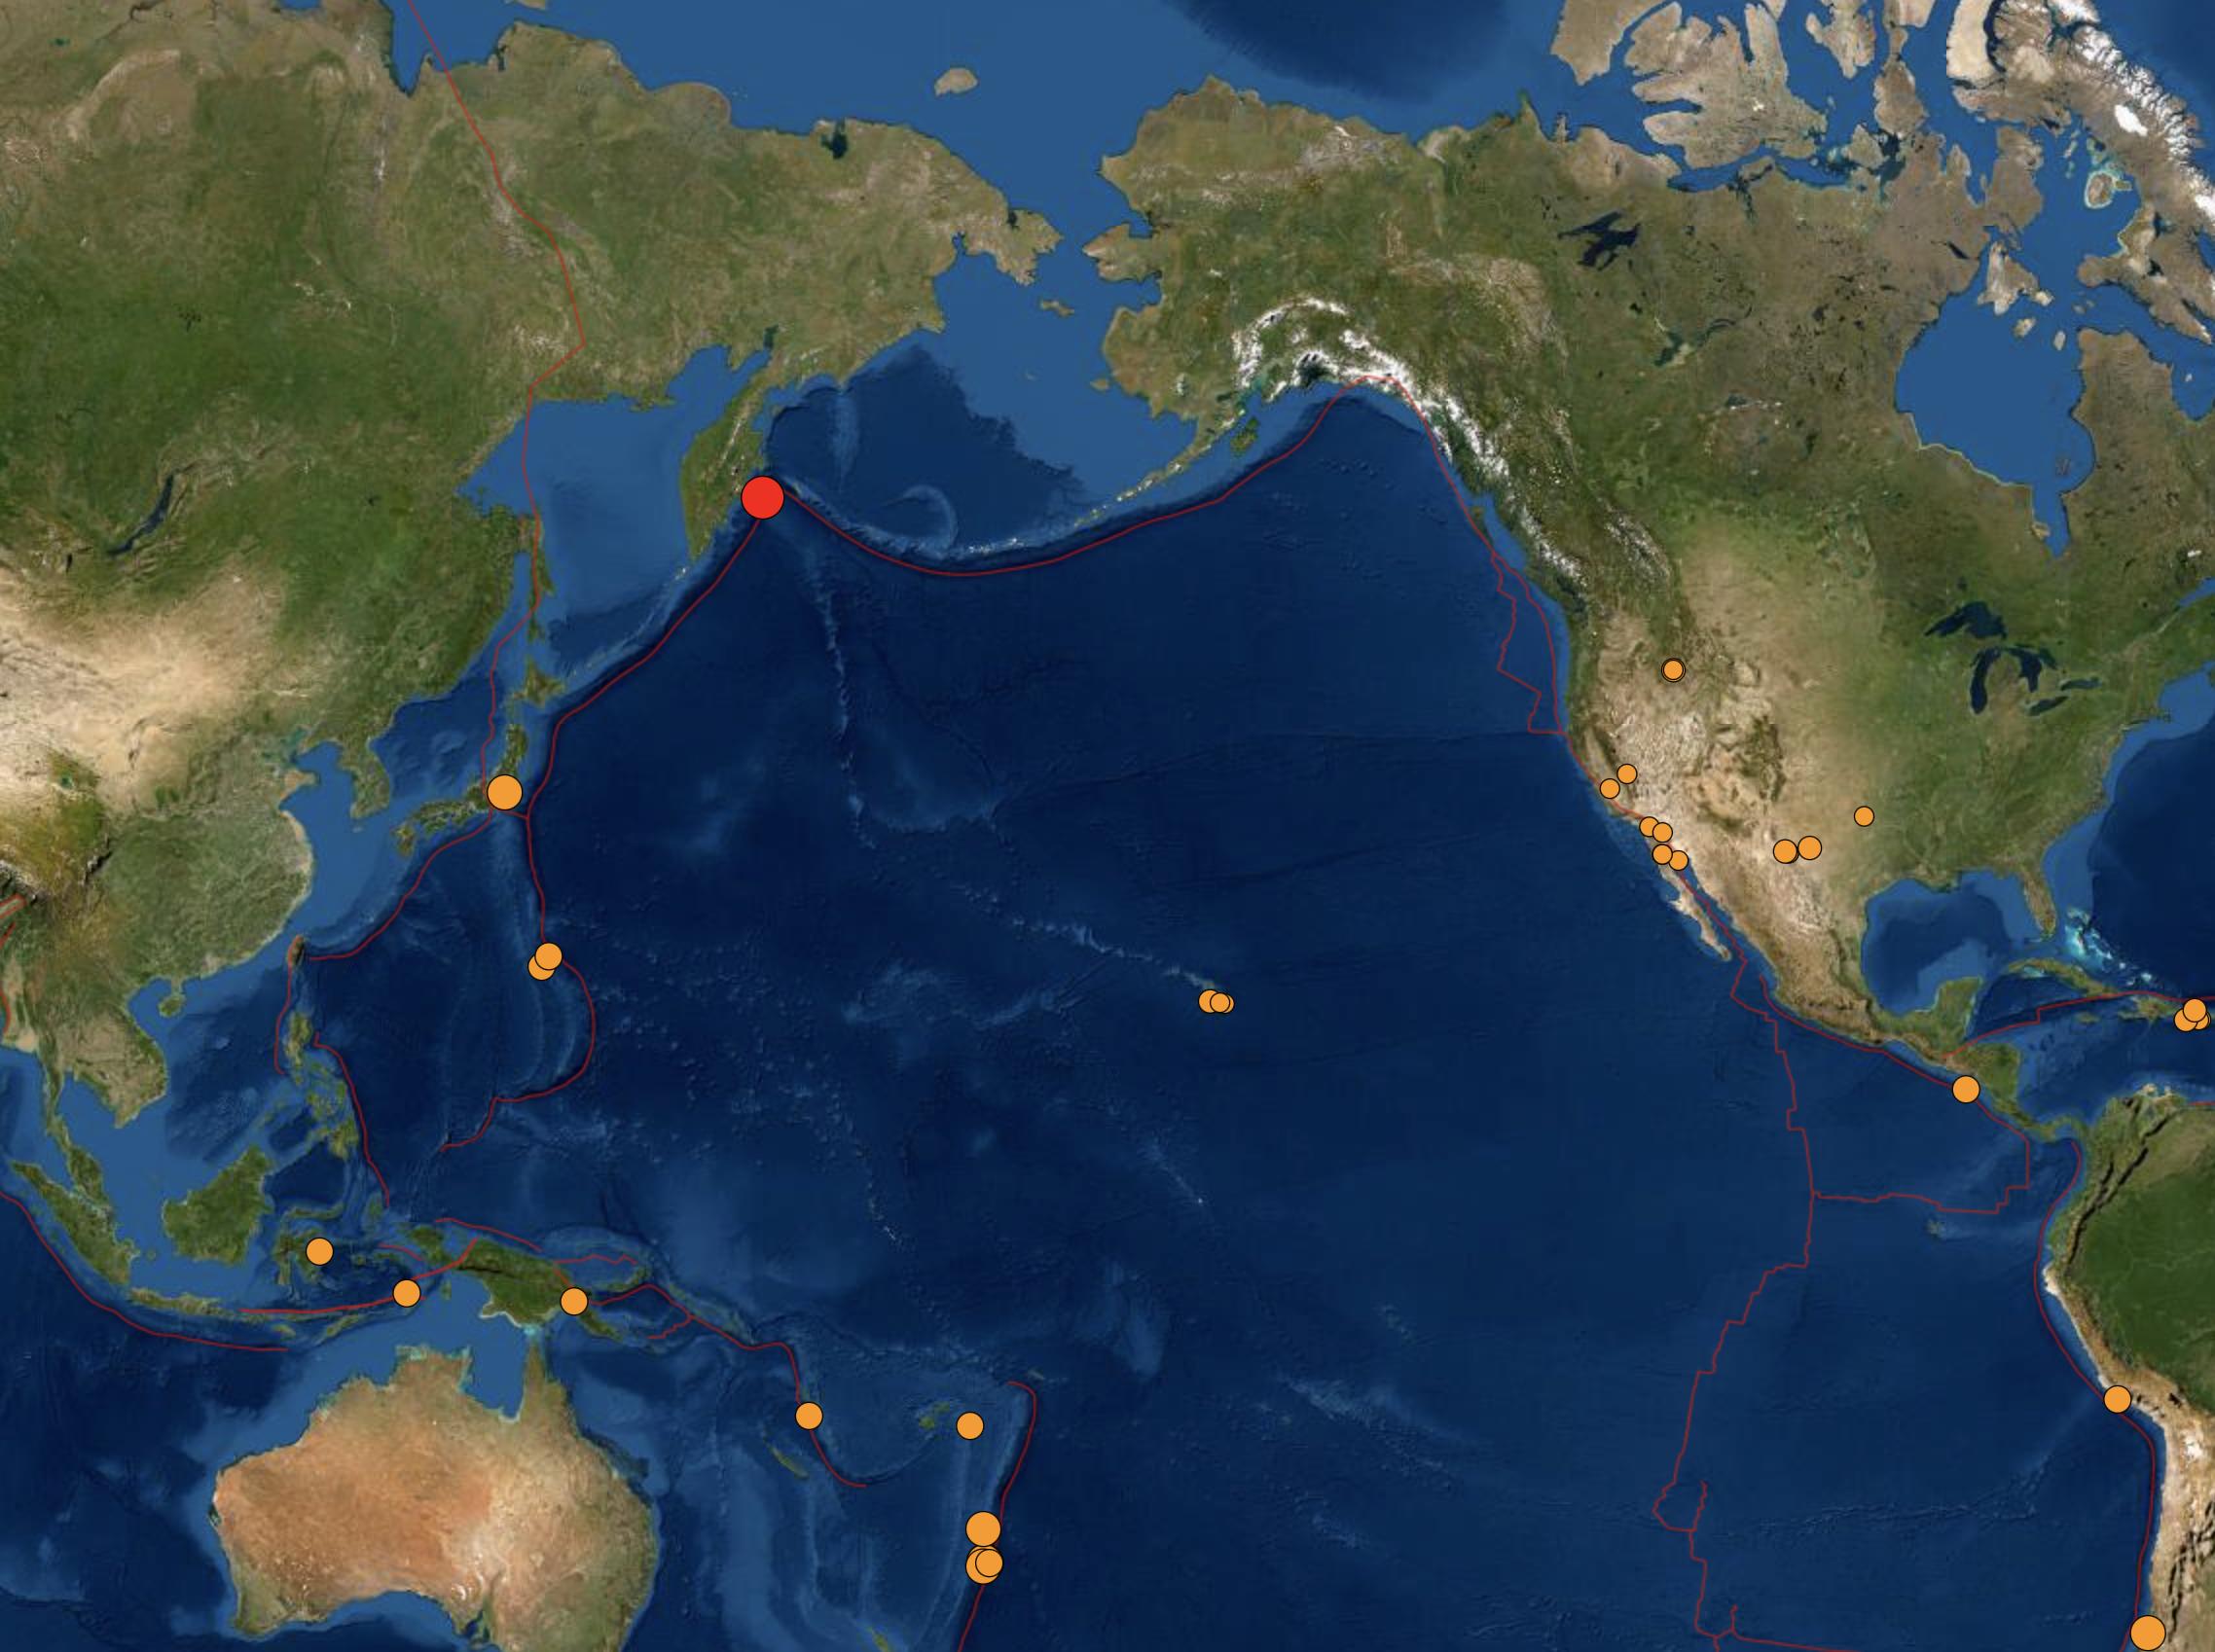 No Tsunami Threat to Hawai'i After 6.9 Russia Earthquake